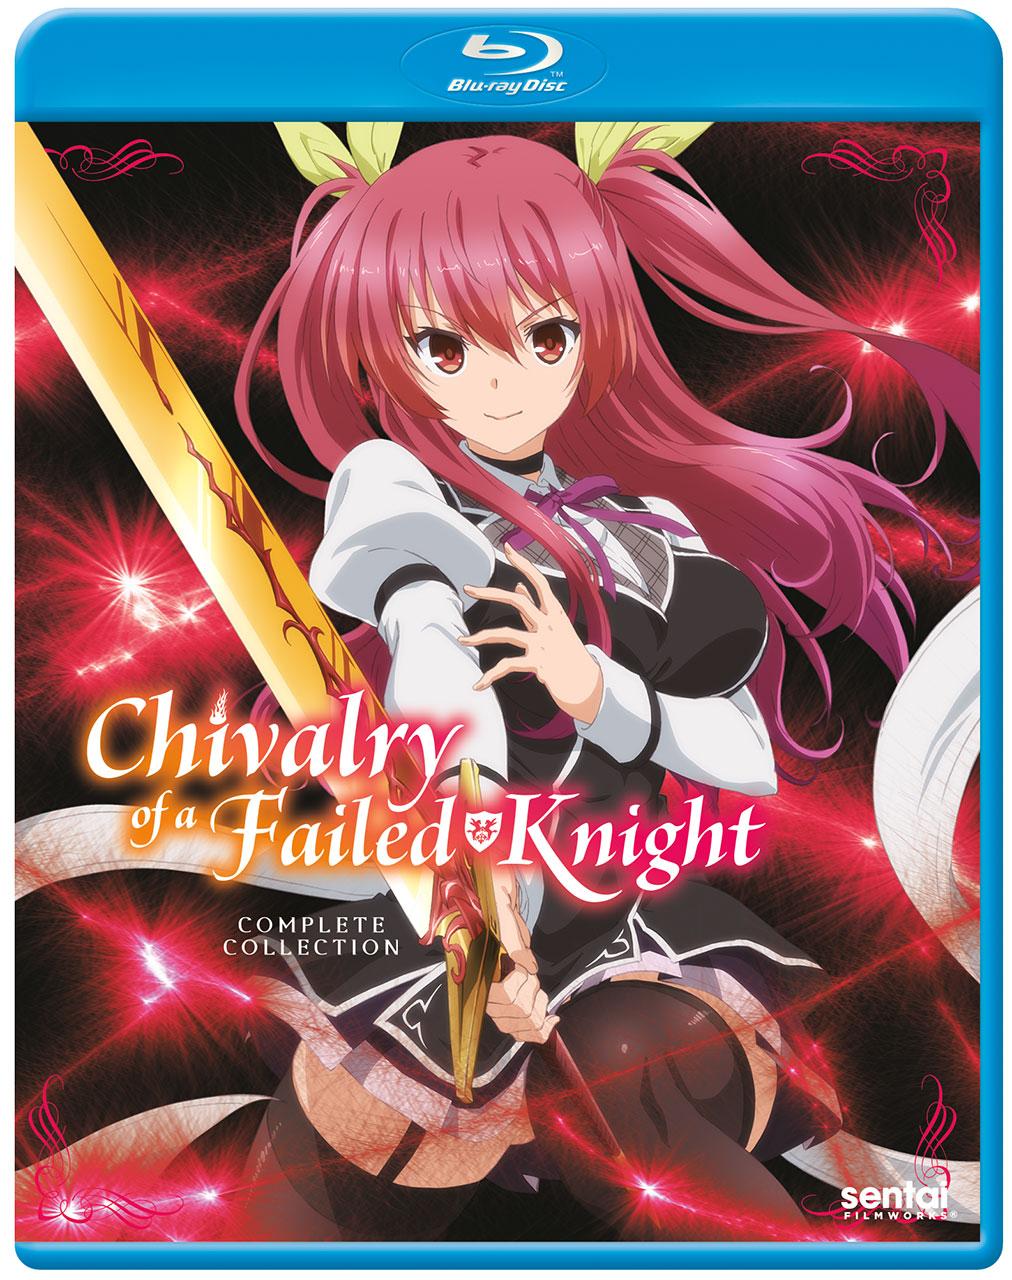 Chivalry of a Failed Knight Blu-ray